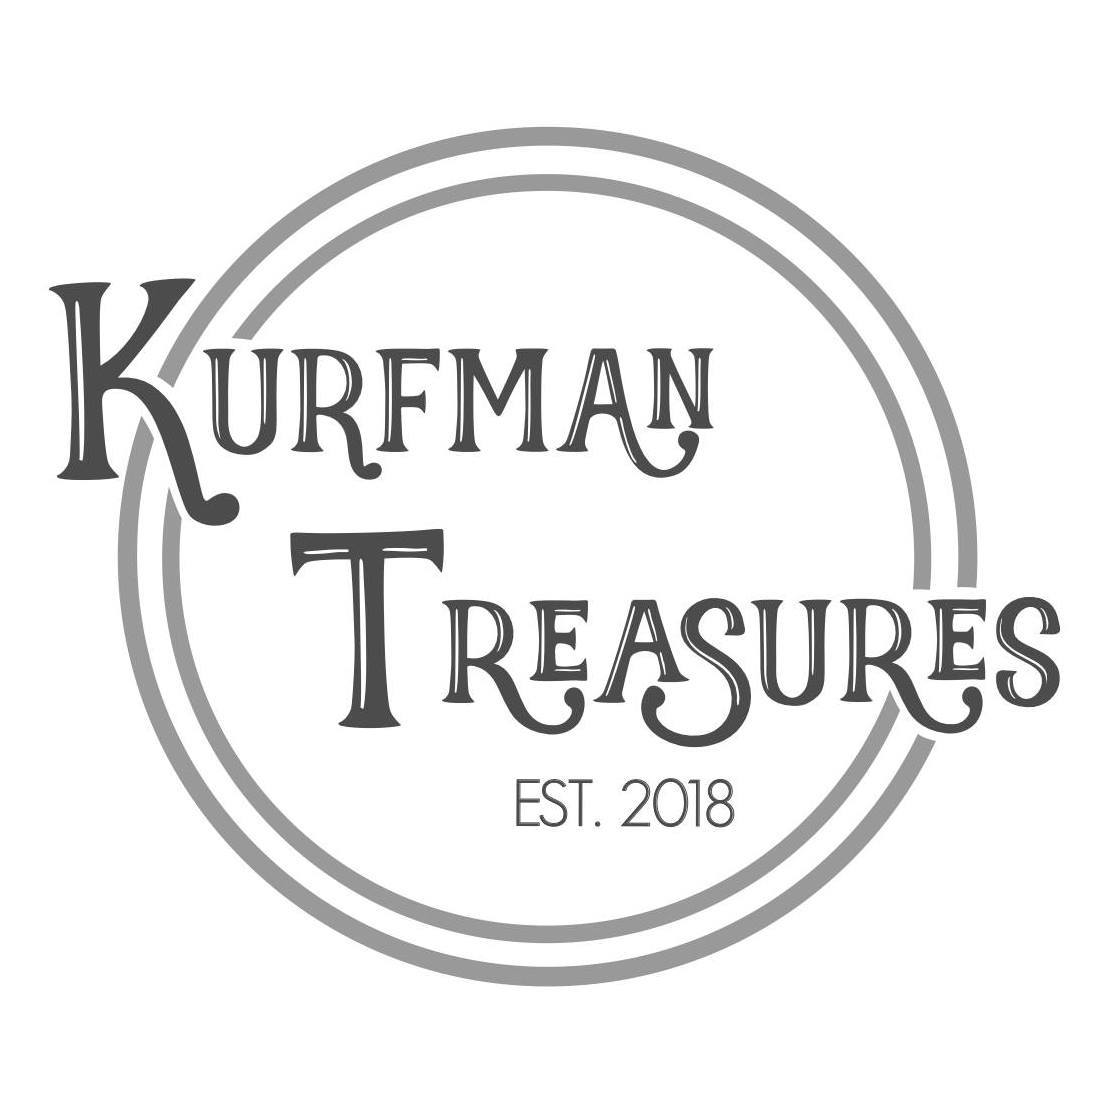 Kurfman Treasures primary image